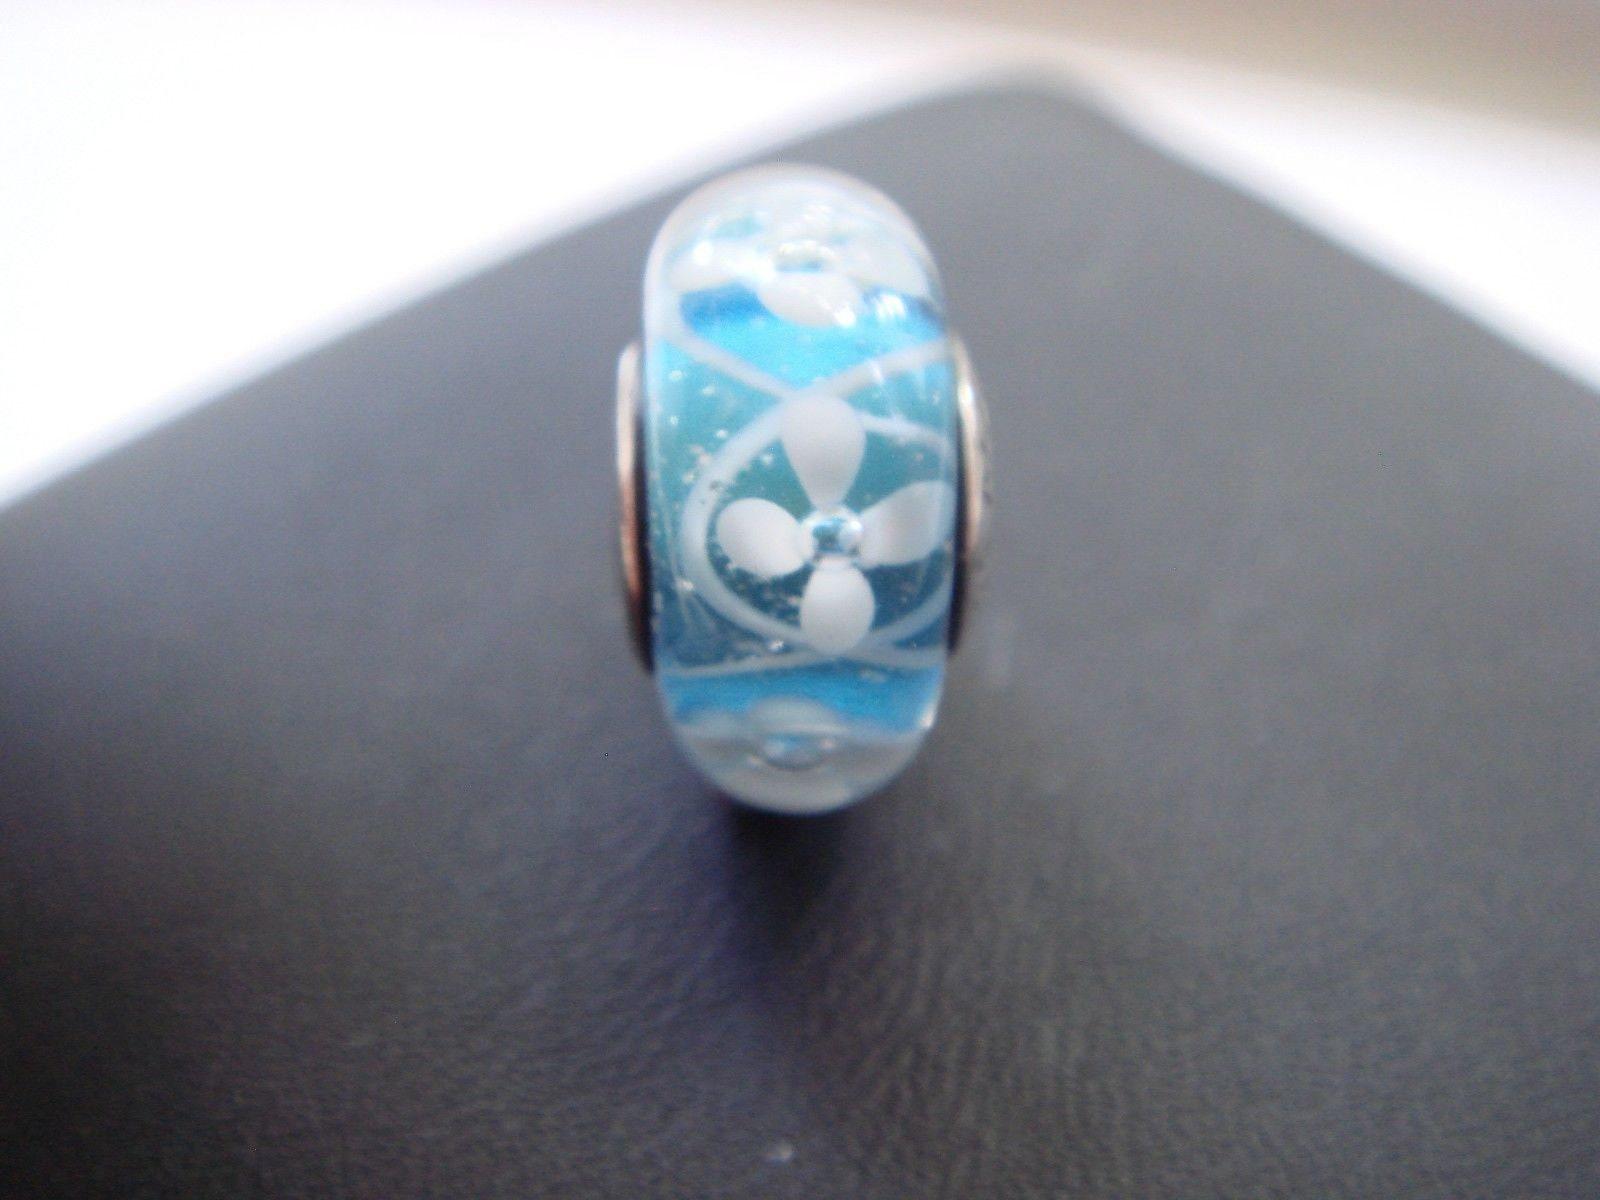 Pandora bracelet charms blue bloom field of flowers glass bead pandora bracelet charms blue bloom field of flowers glass bead new threaded s925 sterling silver fully stamped izmirmasajfo